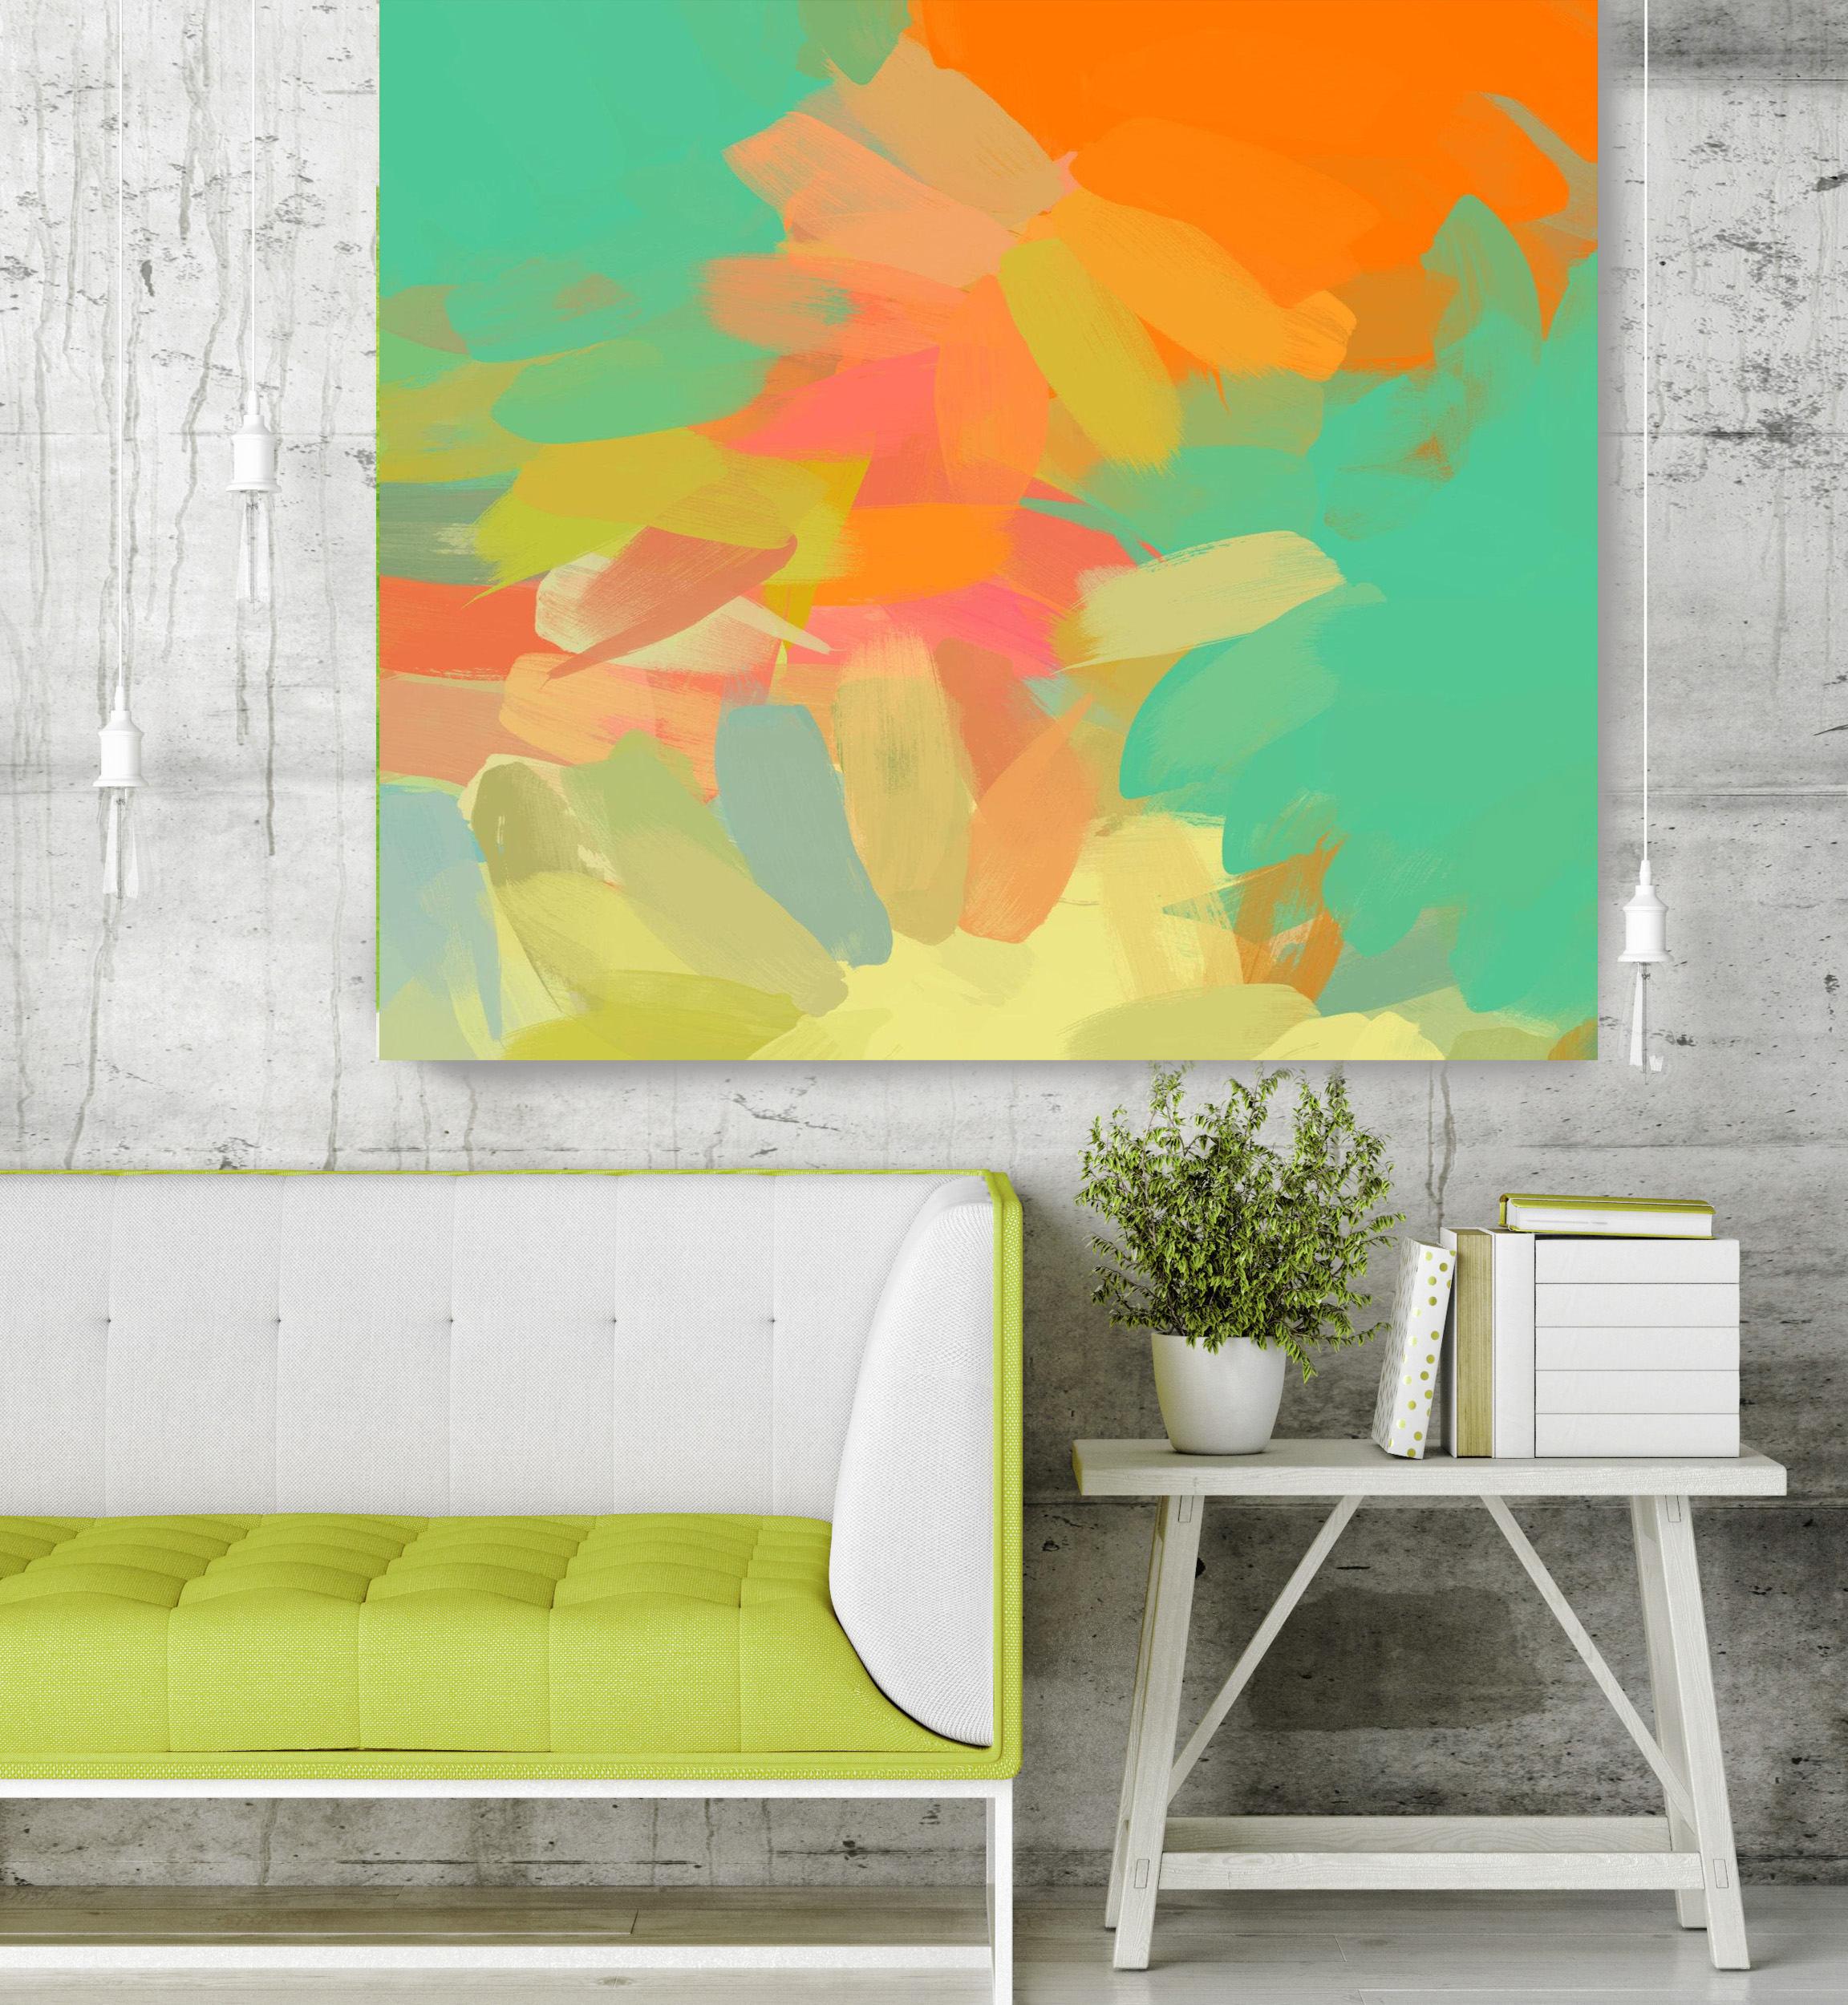 Kaleidoscope N 145-2. Geometrical Abstract Art, Wall Decor, Large ...